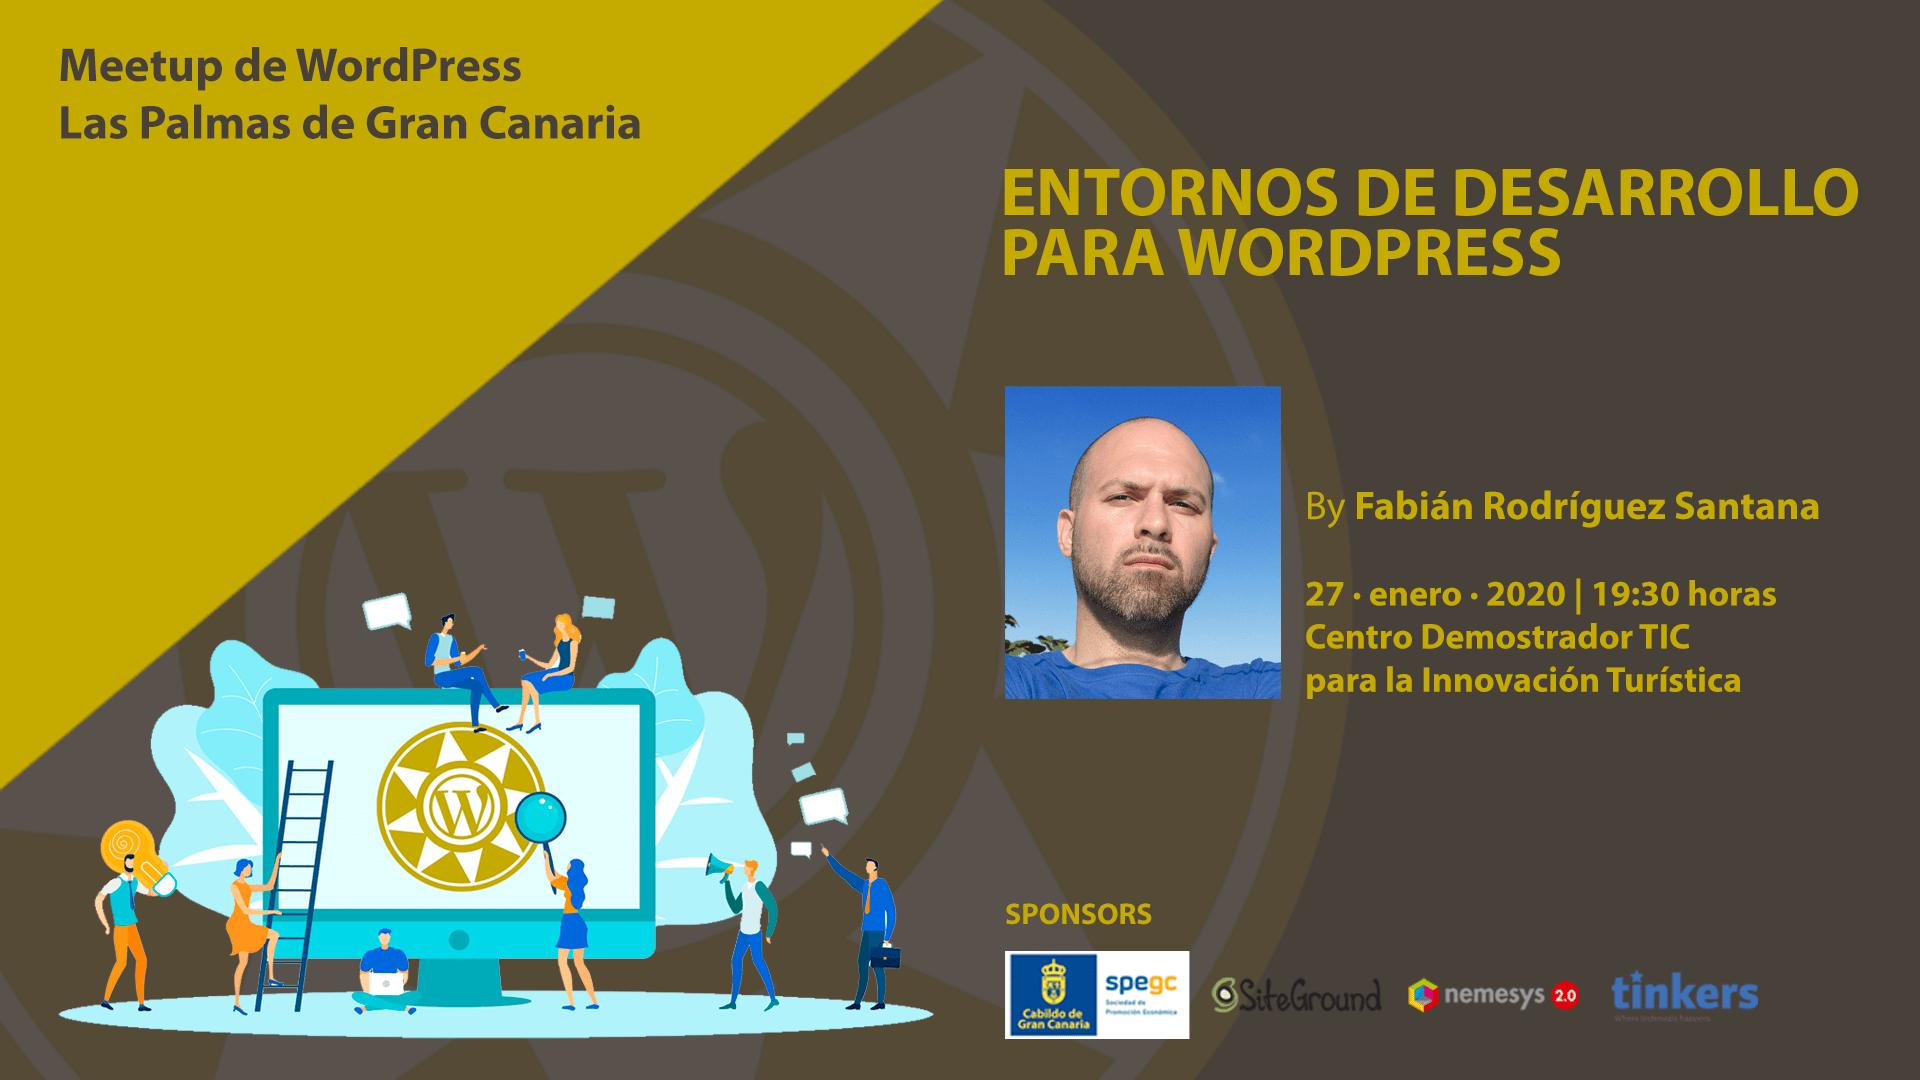 Cartela Meetup Fabián Rodríguez - Entornos de desarrollo